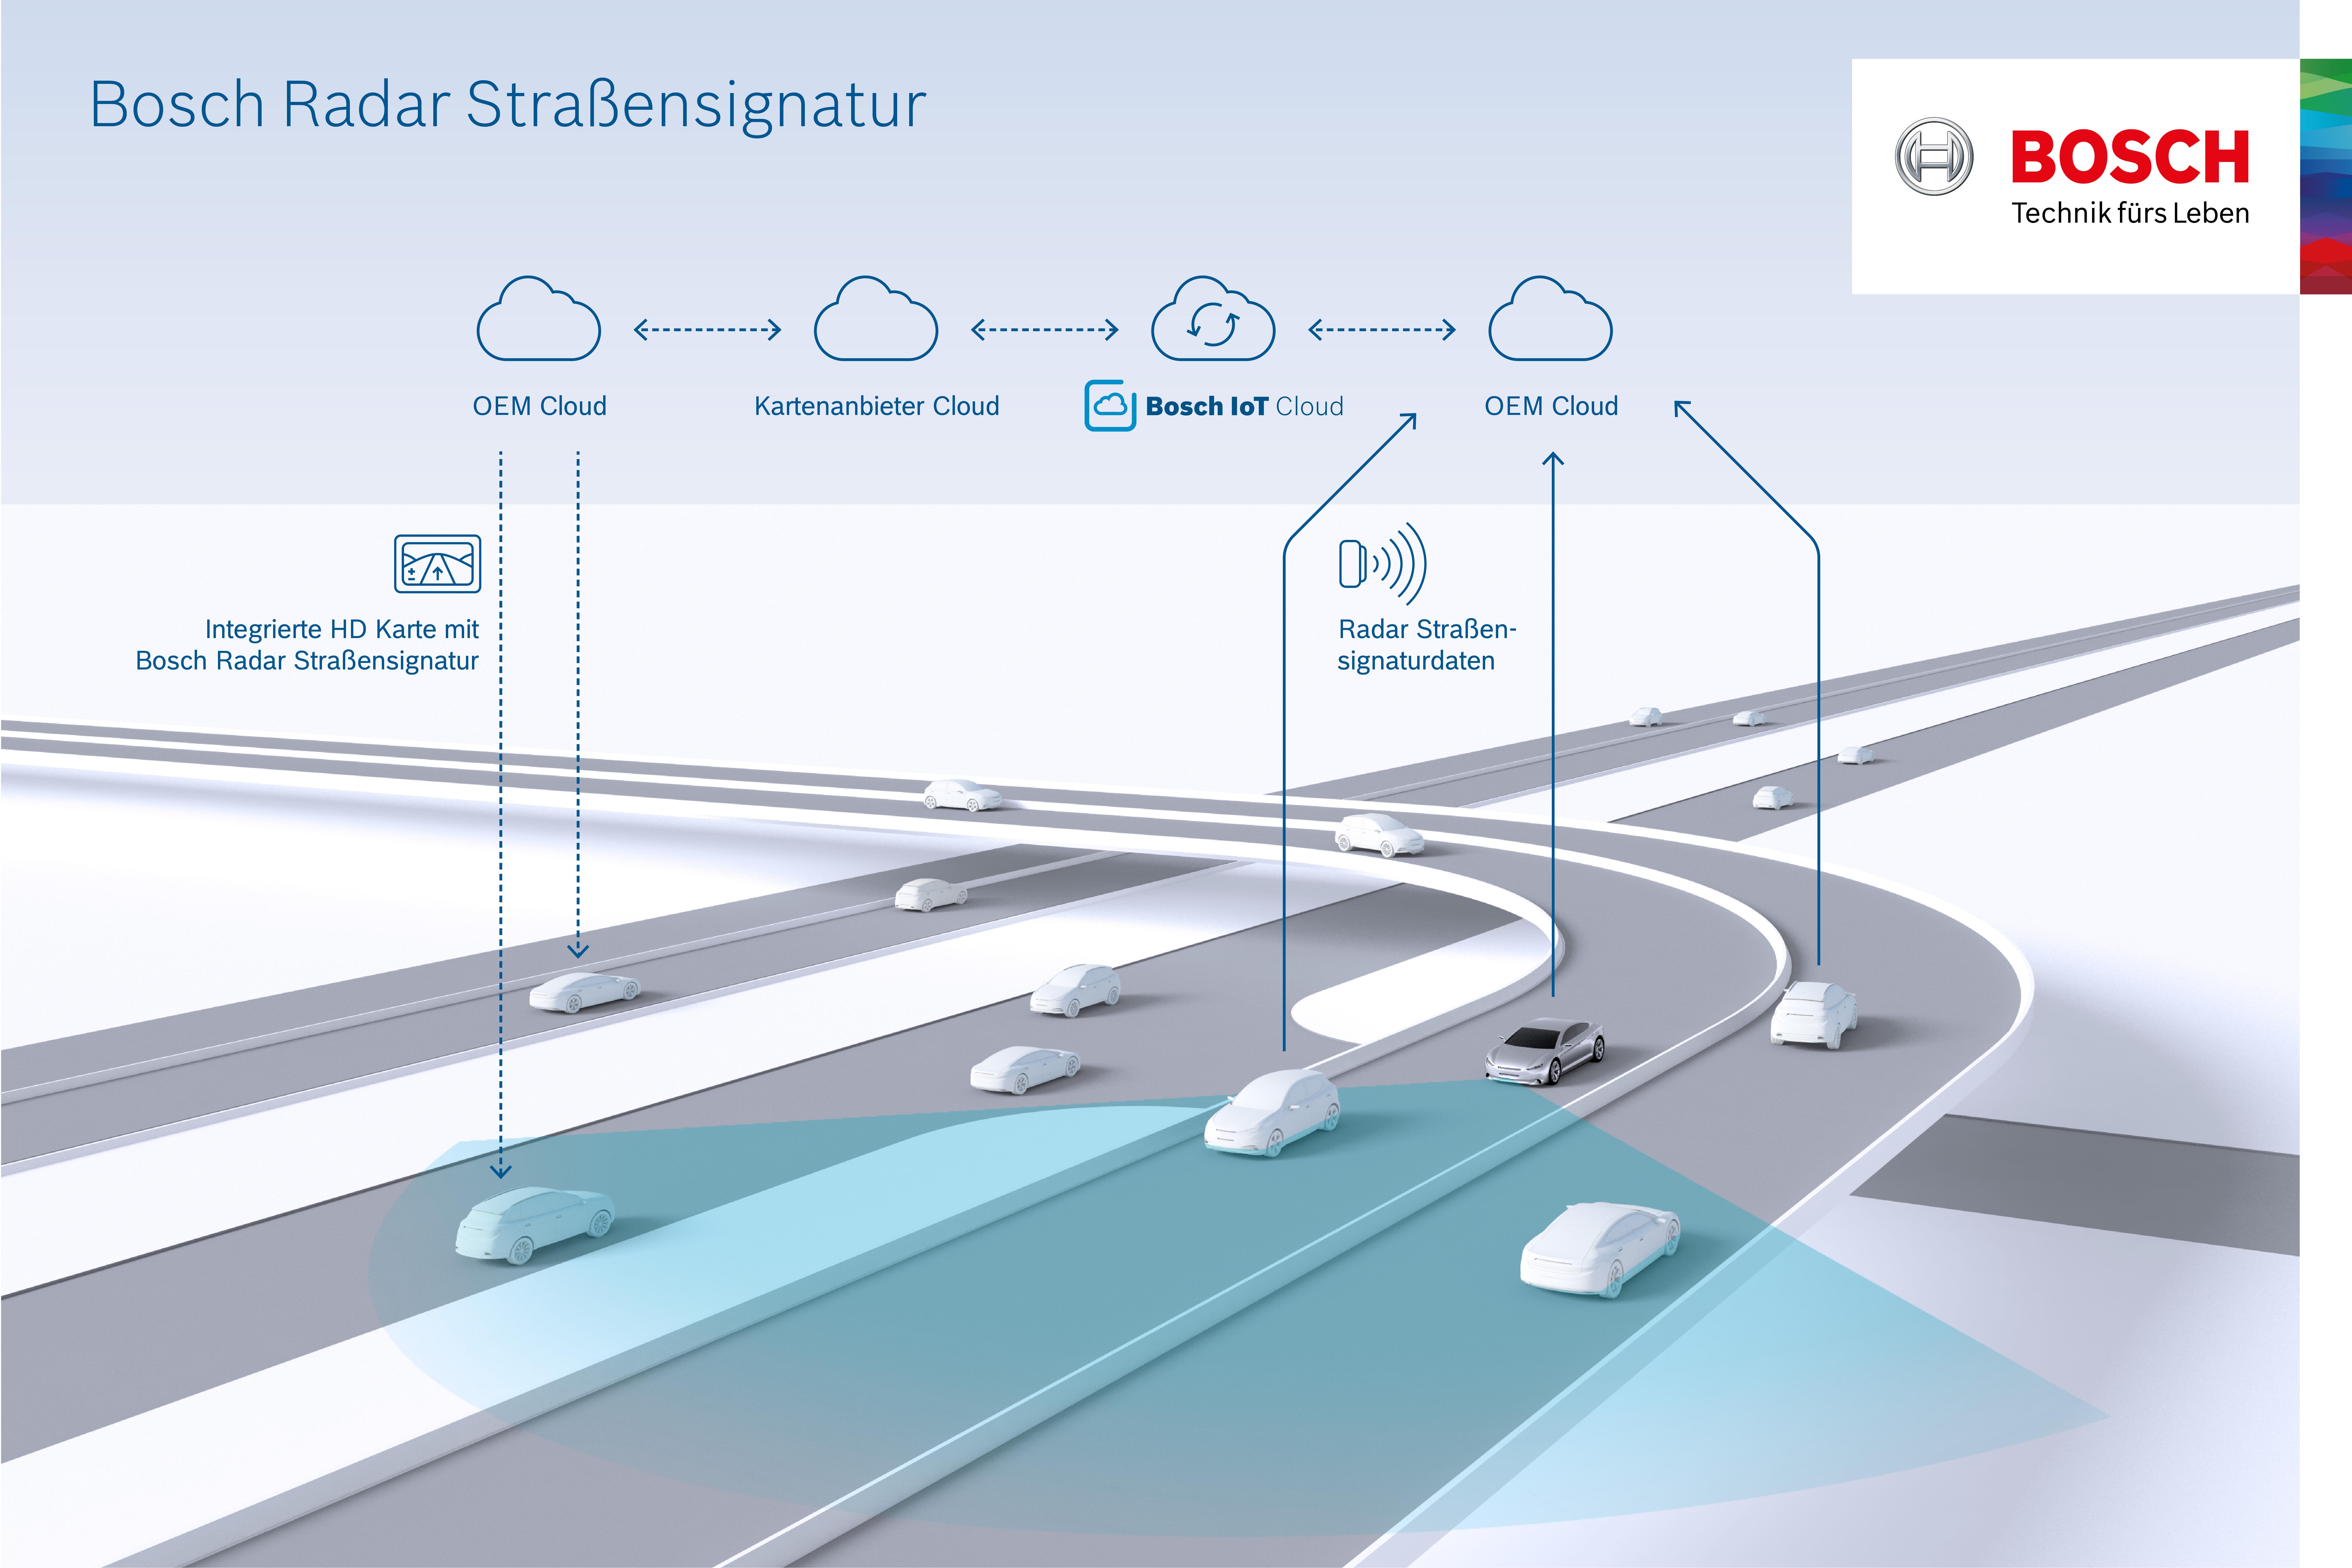 Radar Straßensignatur